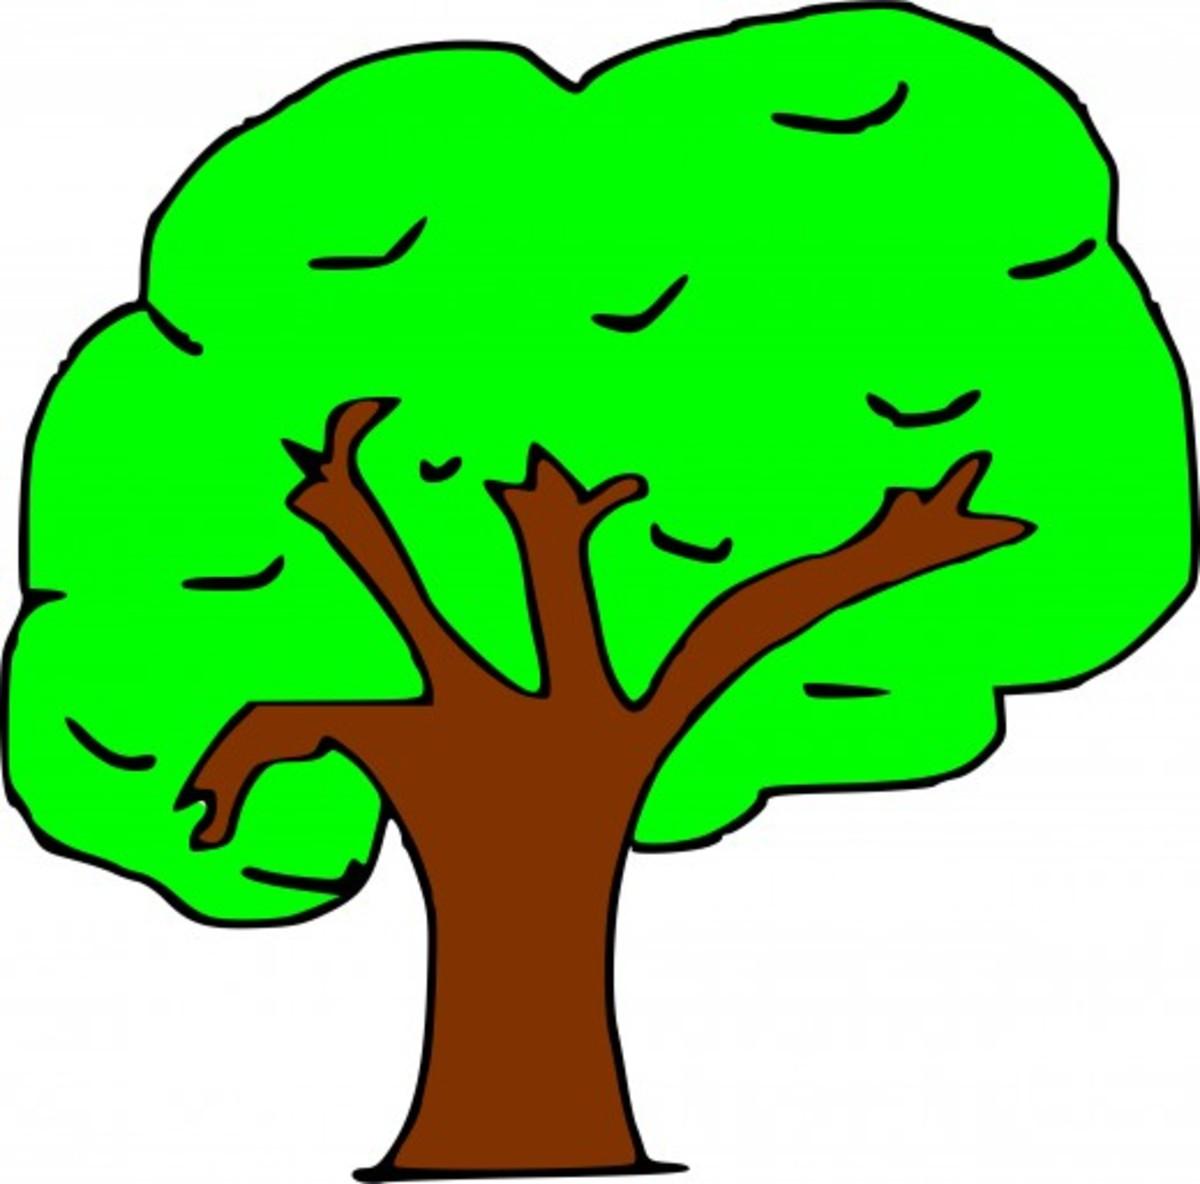 Neon Green Tree